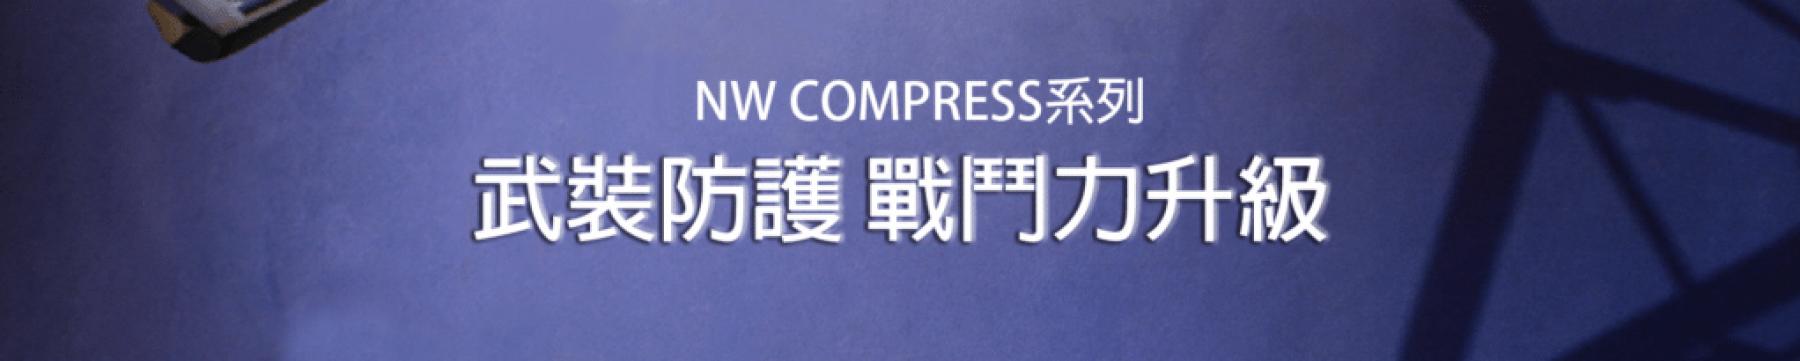 NAVIWEAR SPORT 壓力運動襪 運動防護 COMPRESS